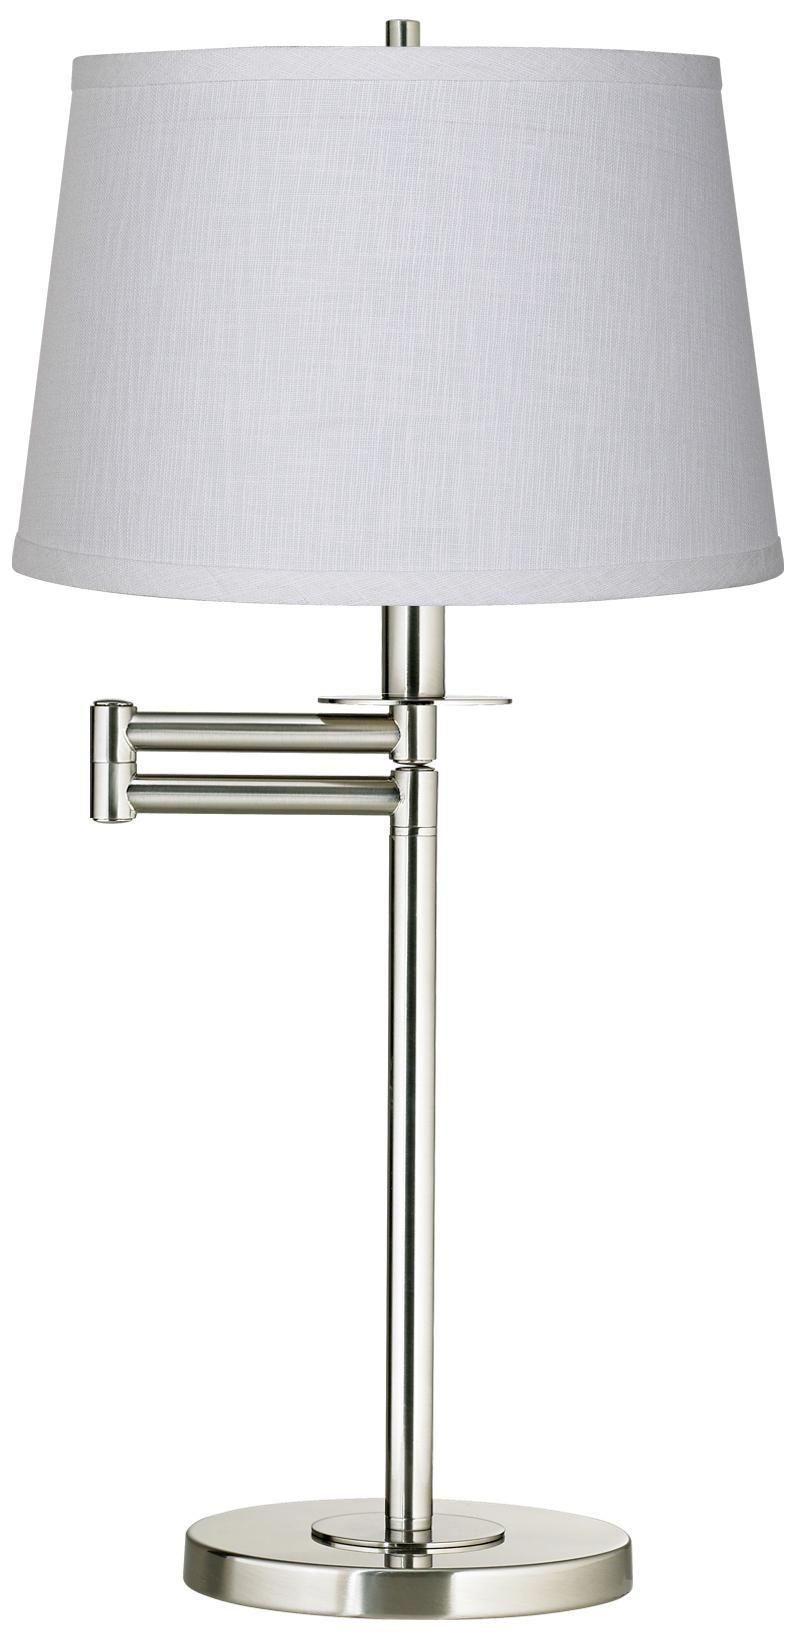 White Fabric Drum Brushed Nickel Swing Arm Desk Lamp